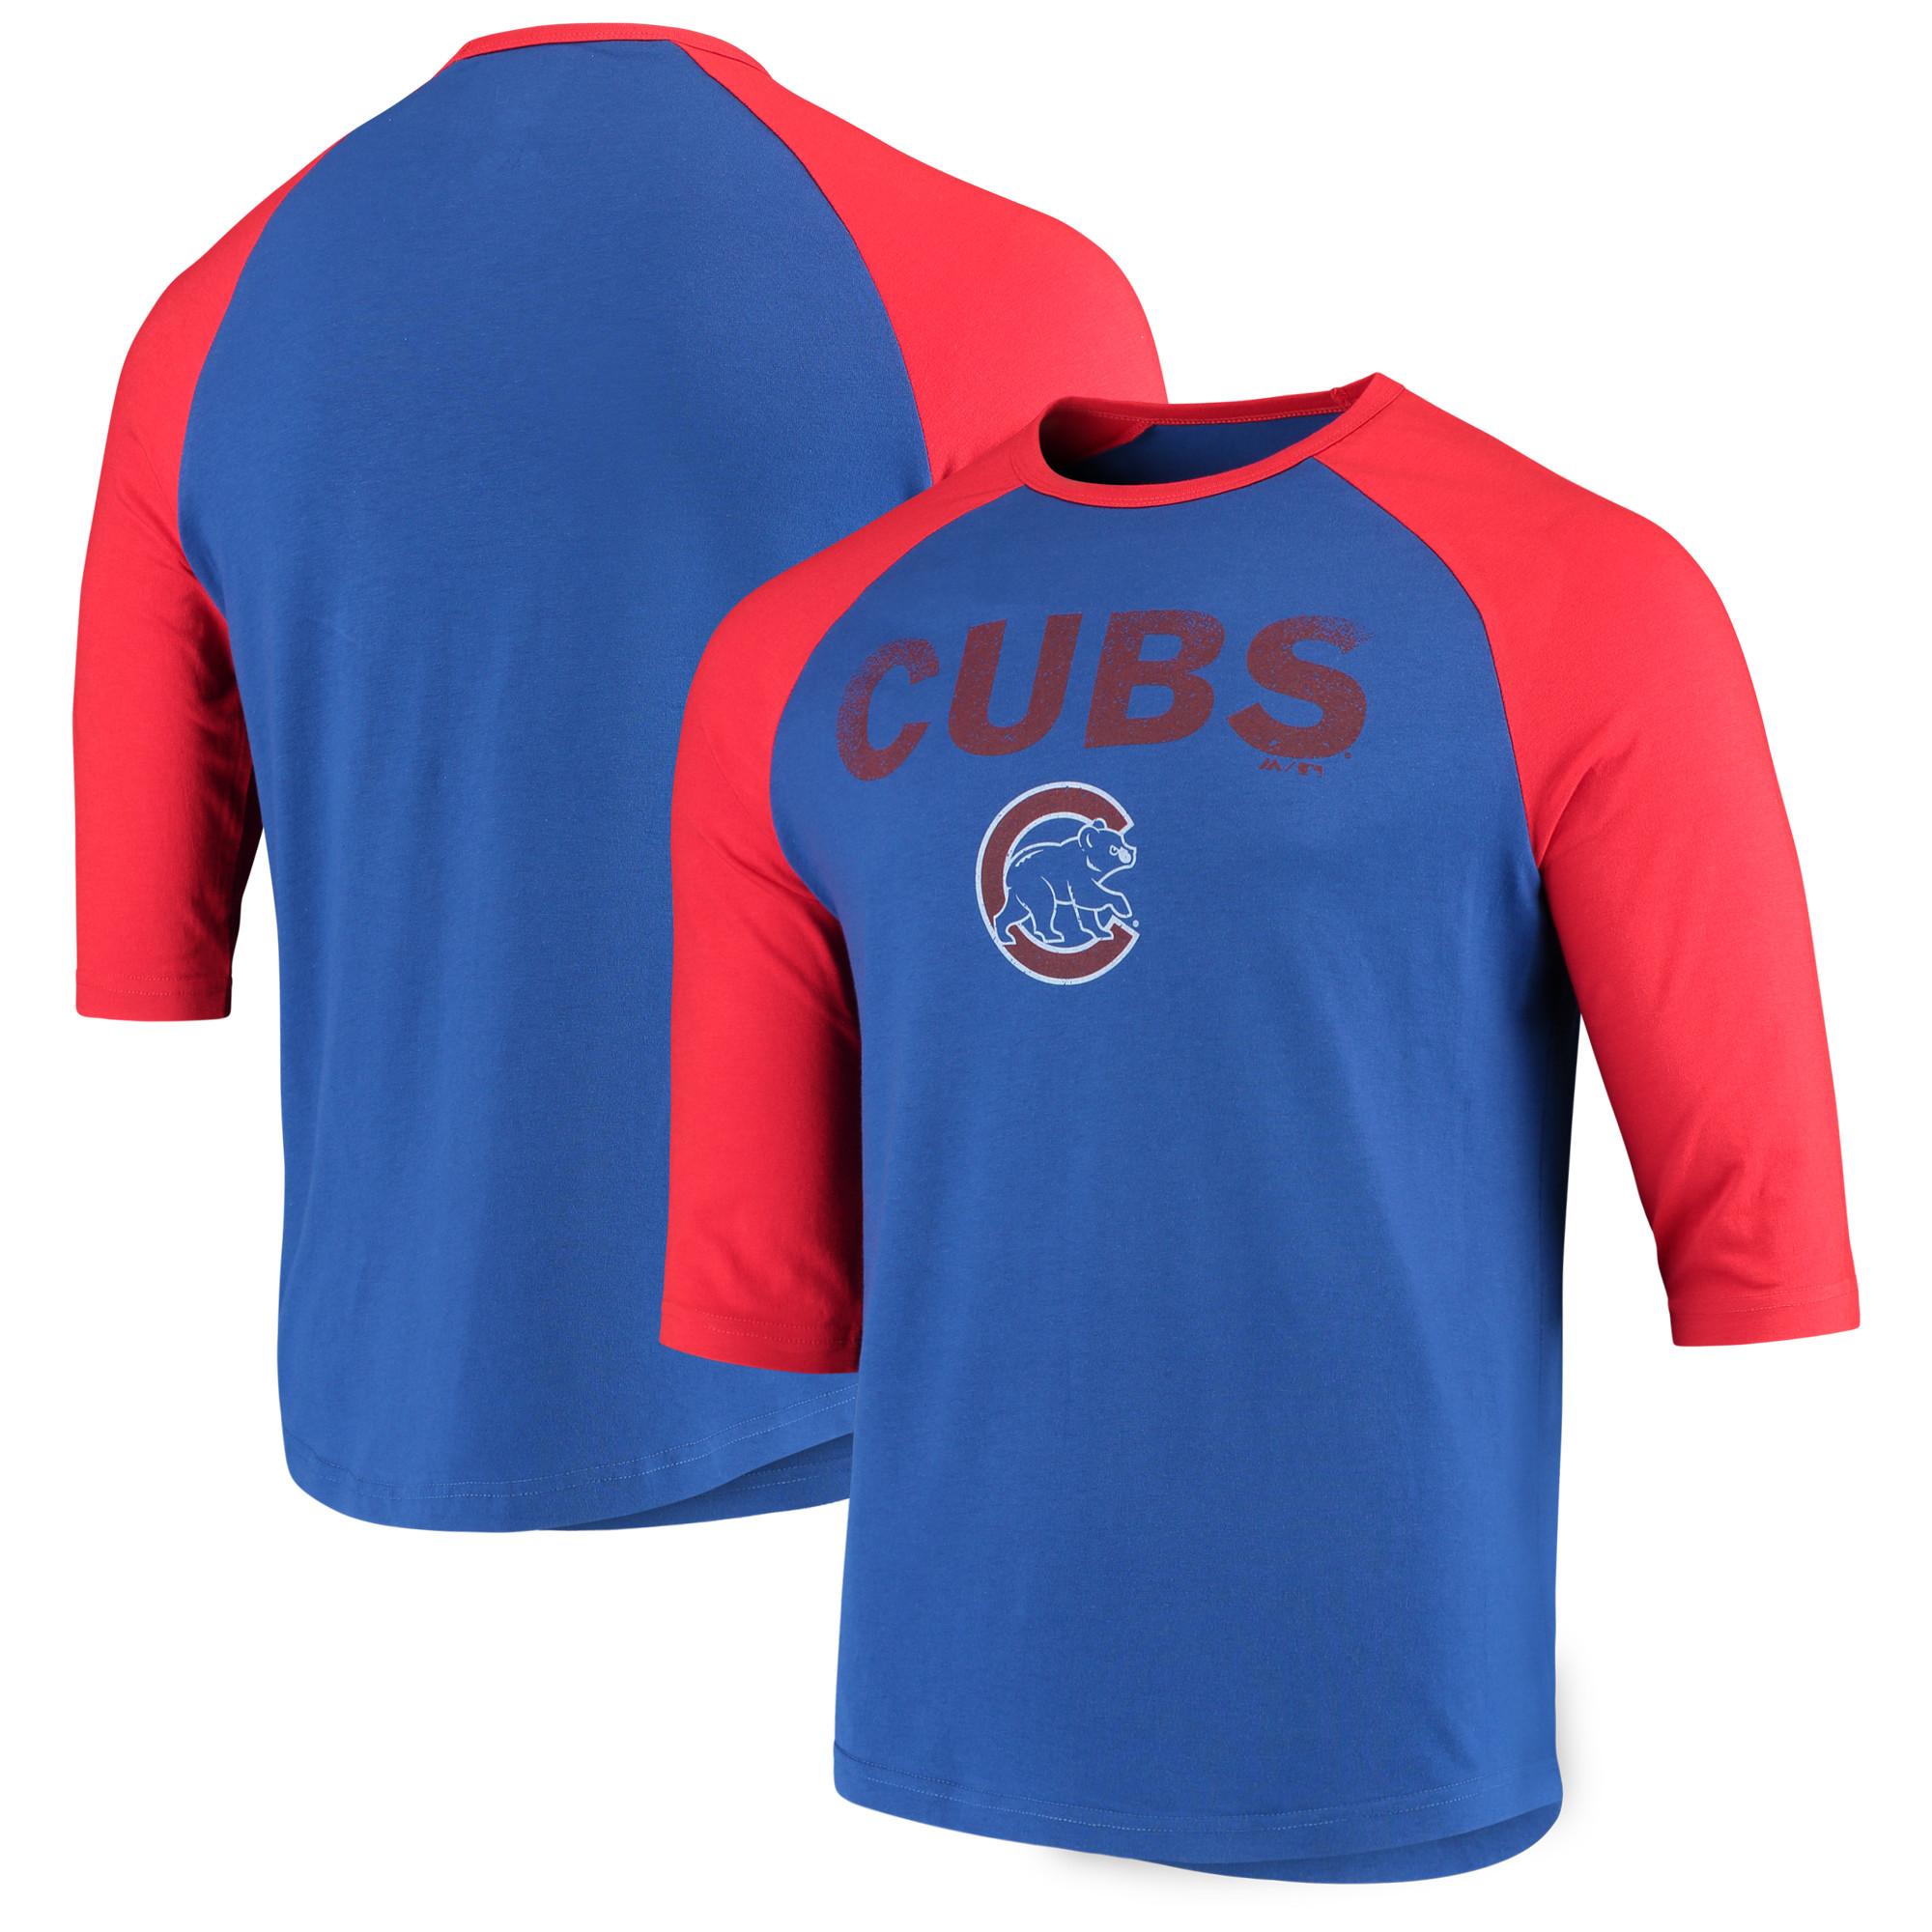 Chicago Cubs Majestic This Season 3/4-Sleeve Tri-Blend Raglan T-Shirt - Royal